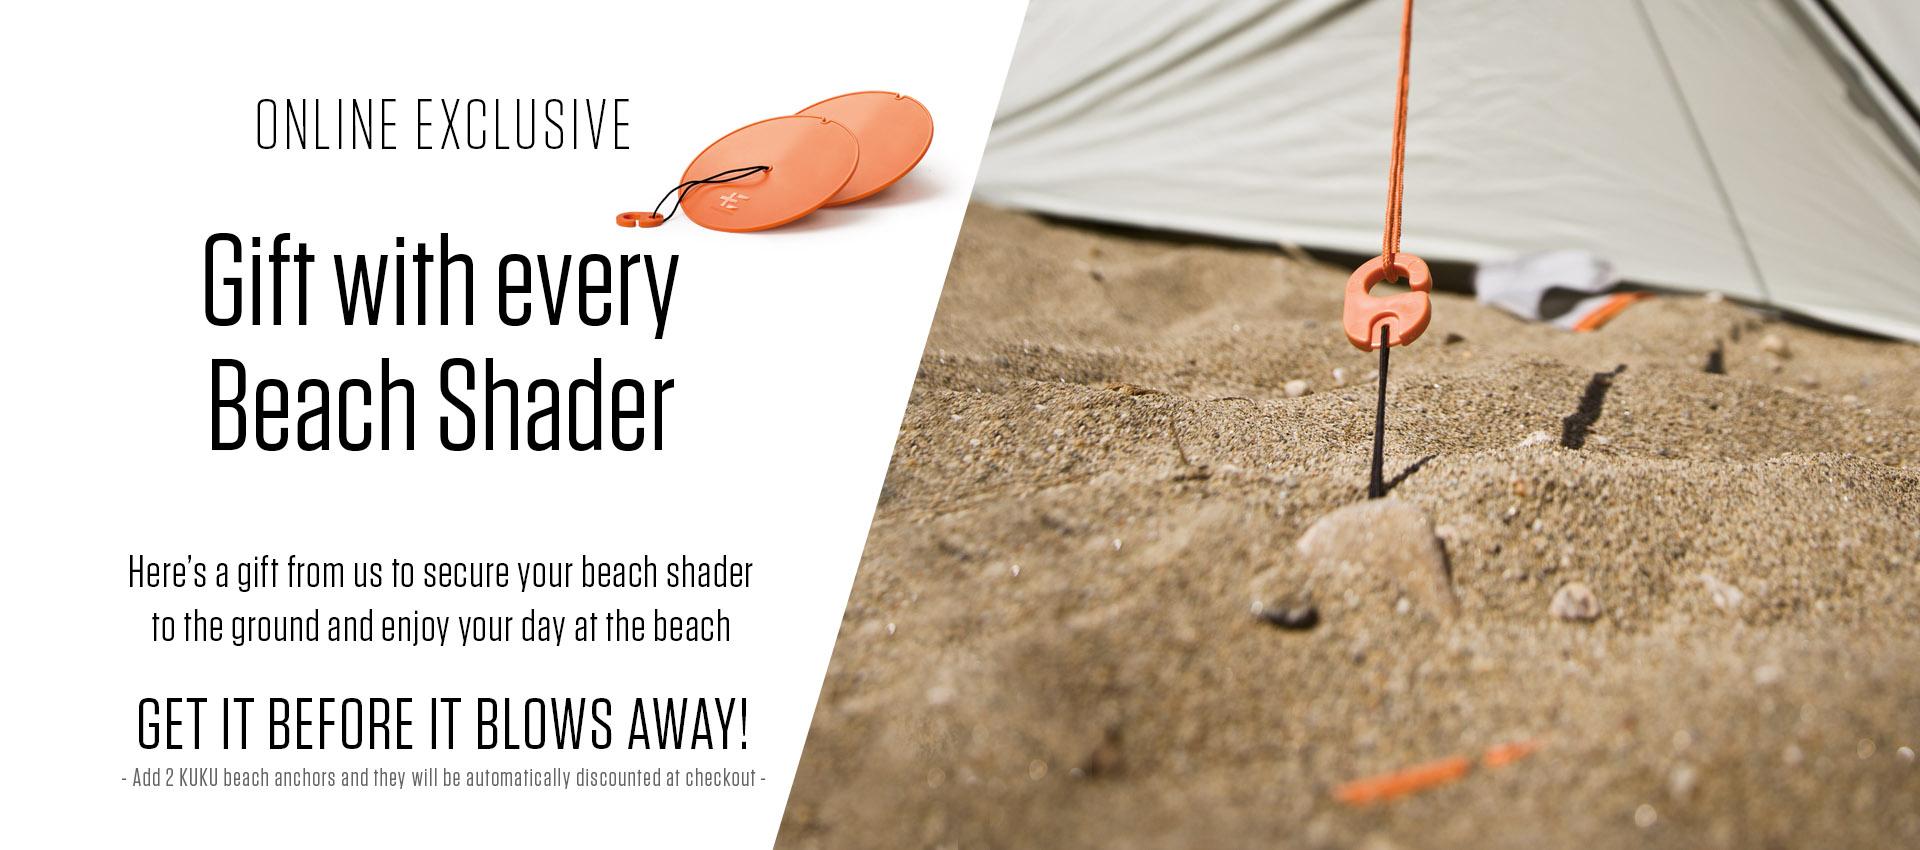 With every Beach Shader get 2 KUKU beach anchors free